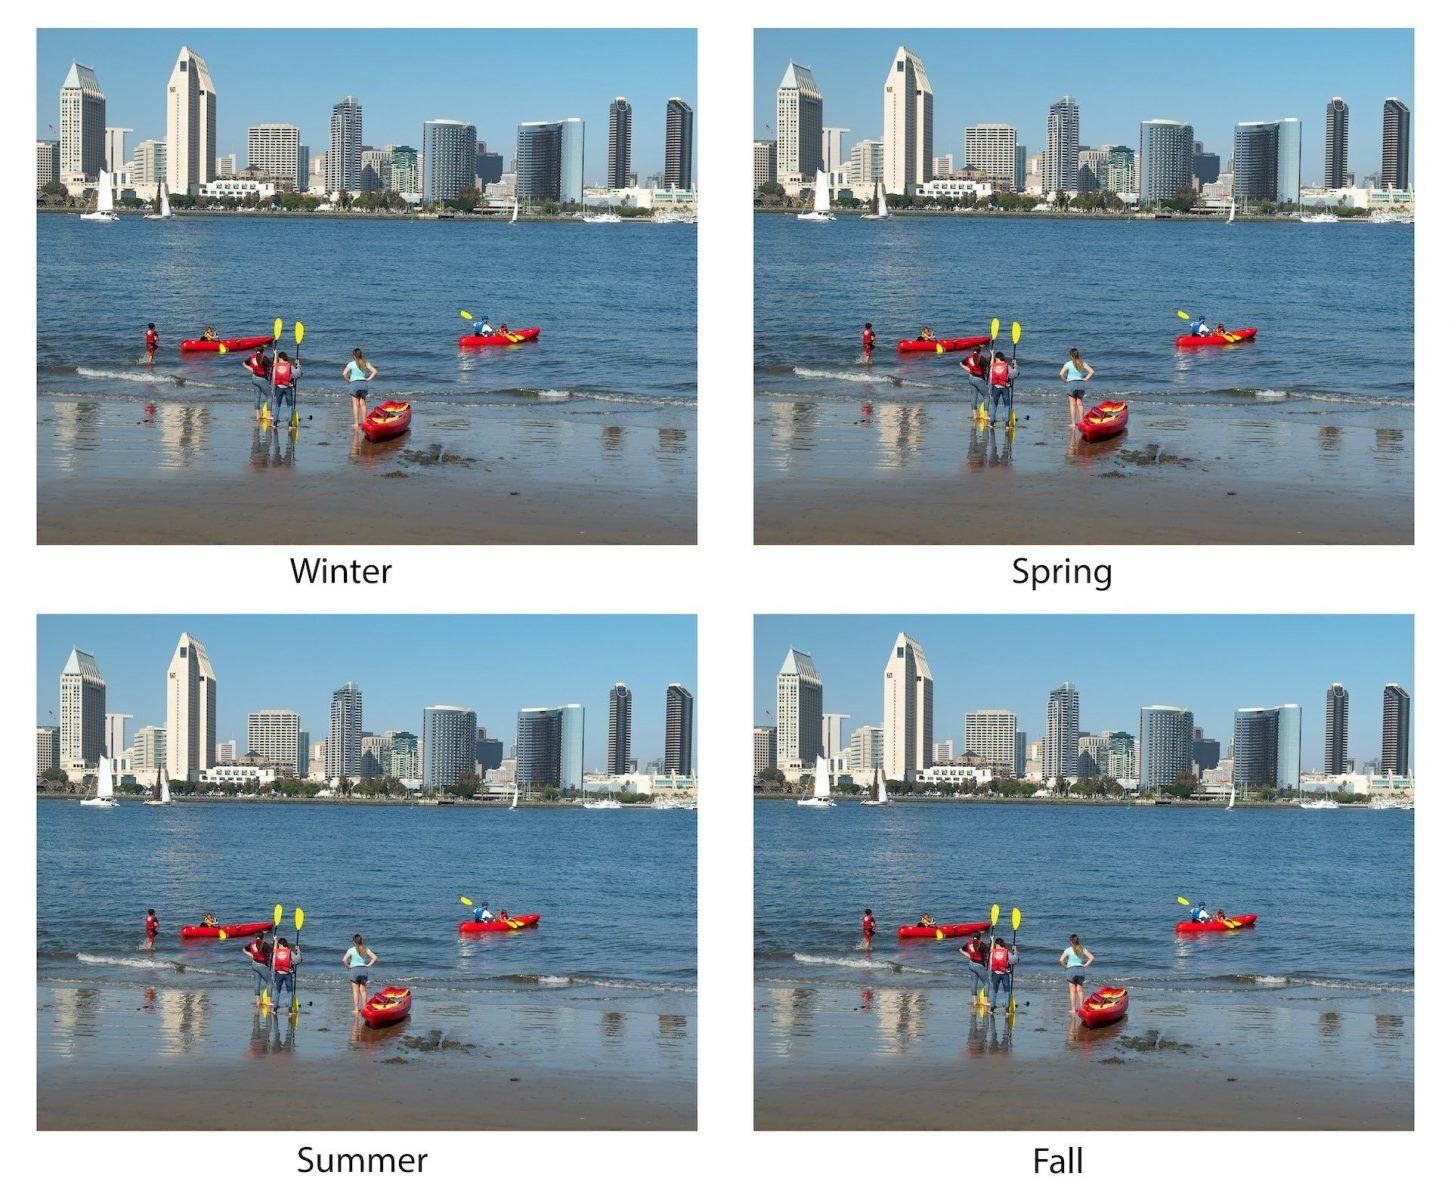 David Klich - The Four Seasons of San Diego